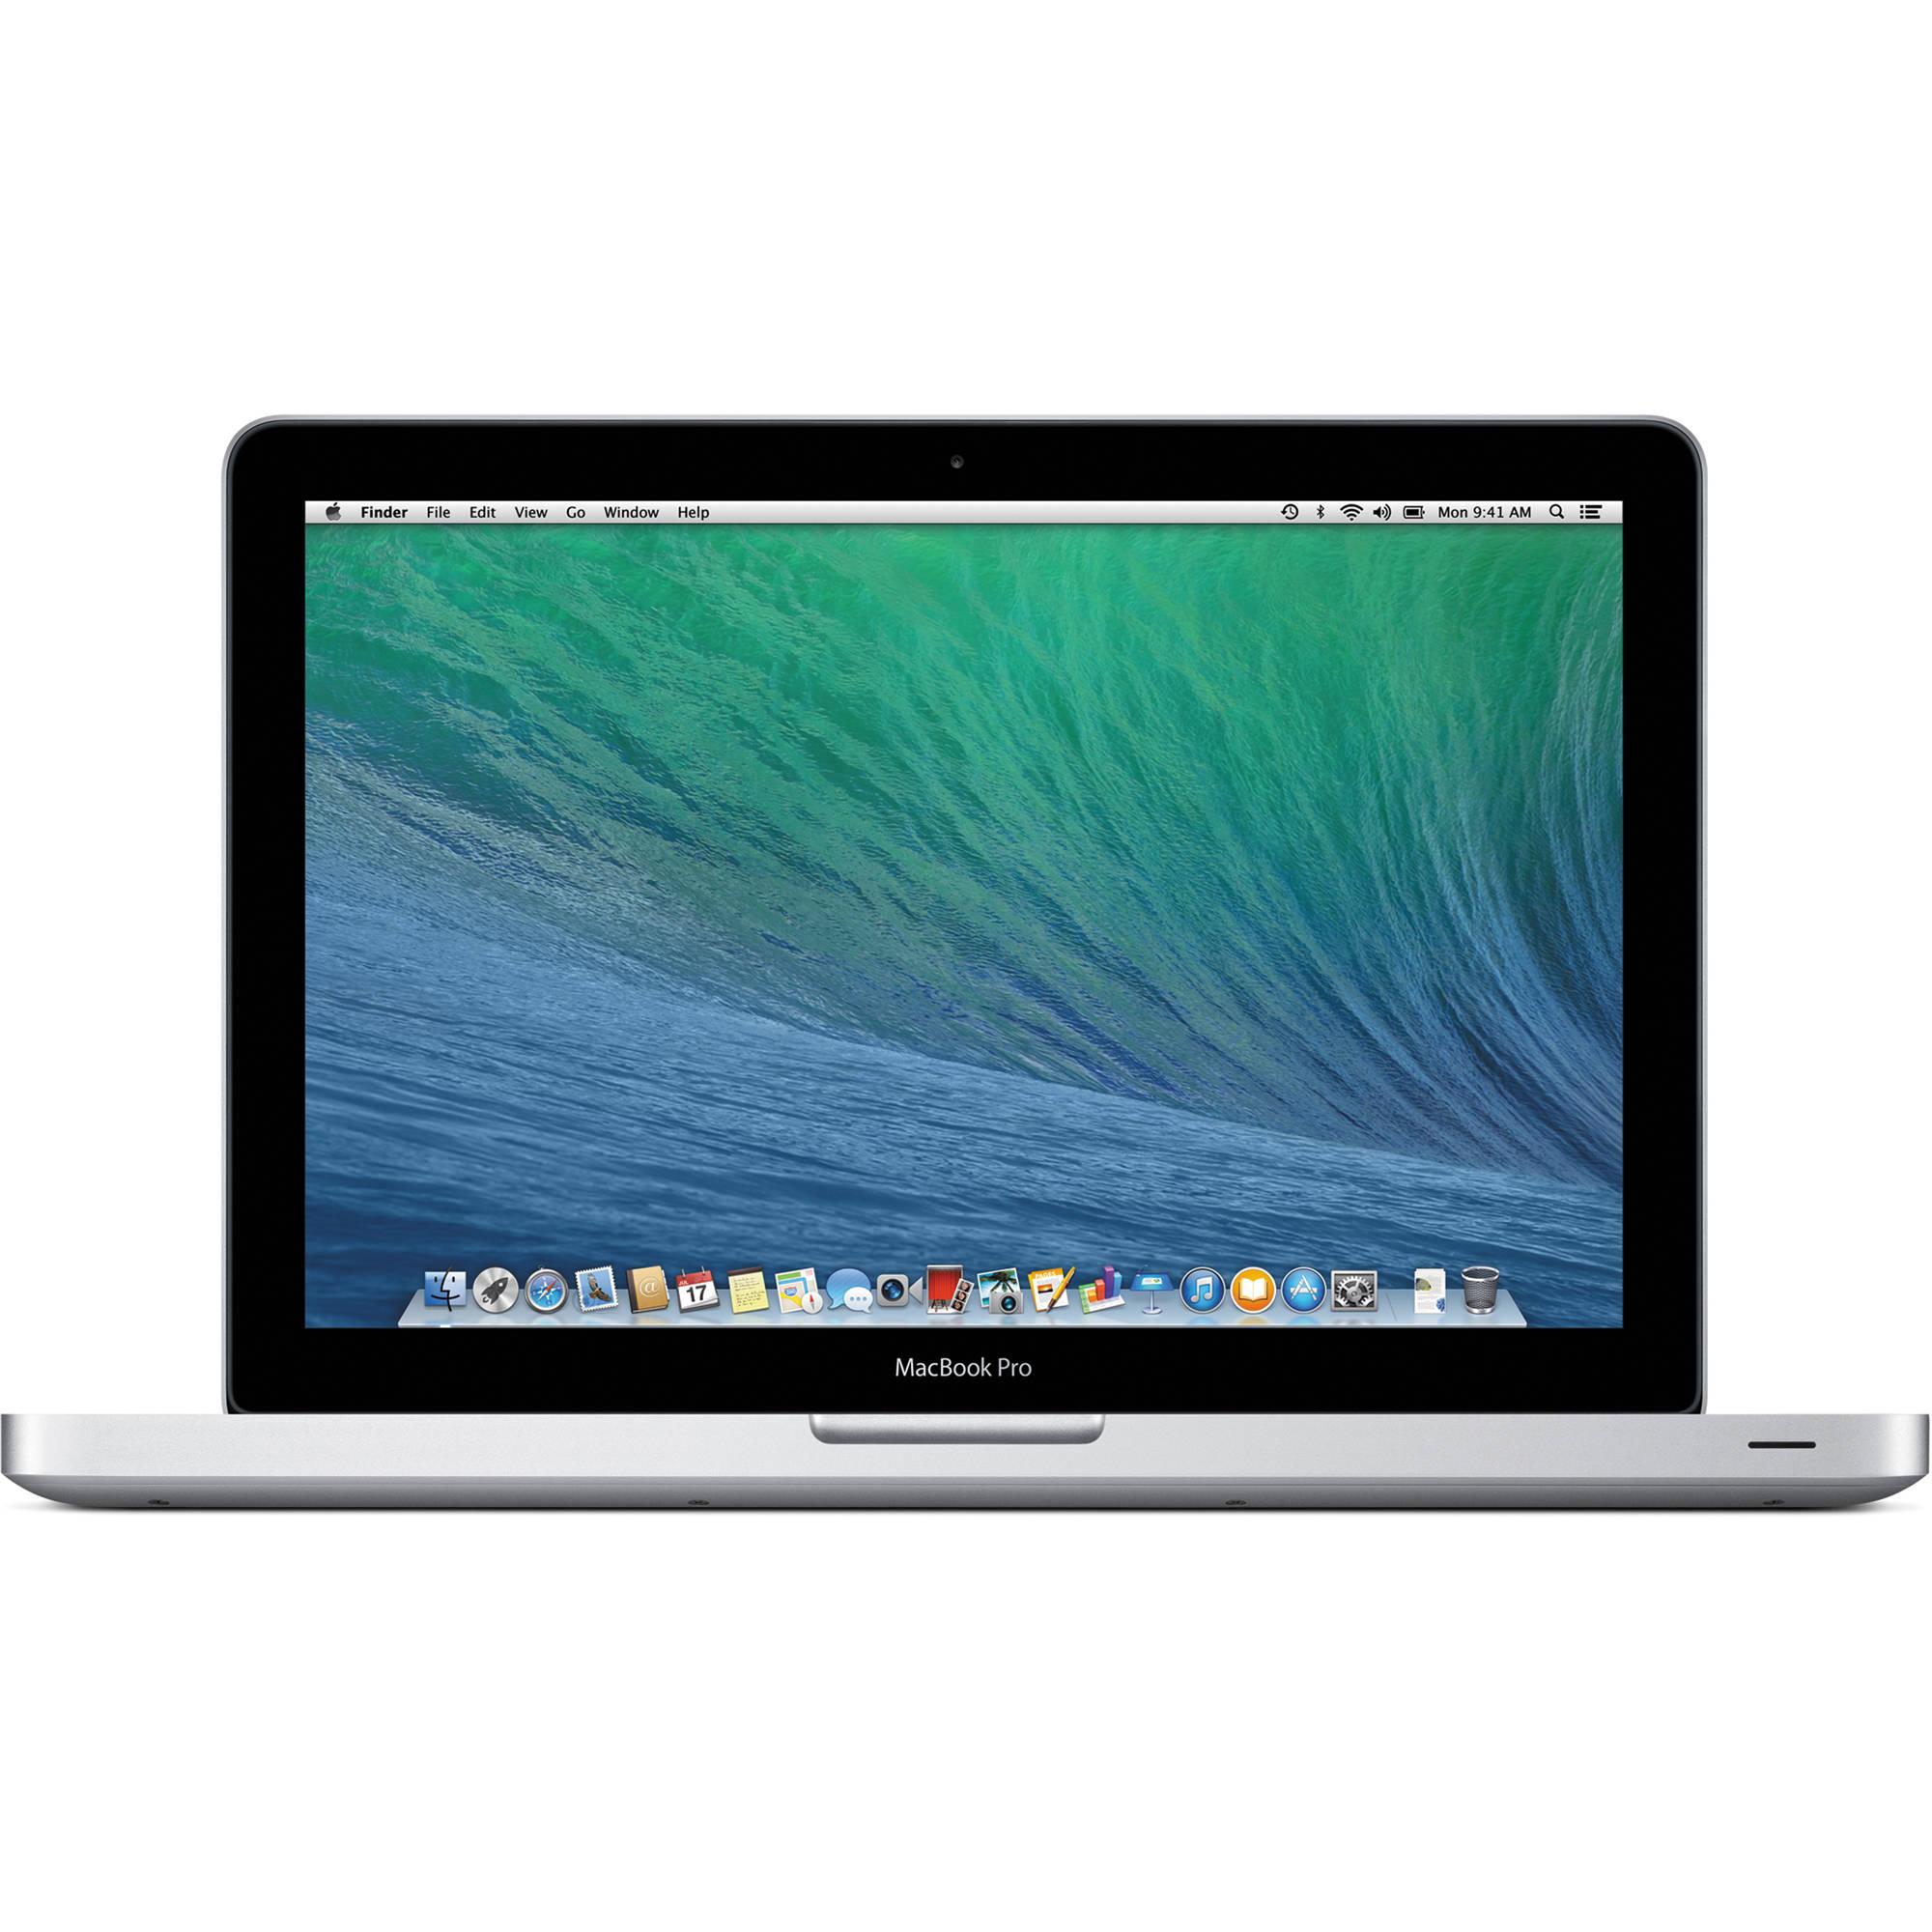 apple 13 3 macbook pro notebook computer z0mt md1013 b h rh bhphotovideo com MacBook Pro Covers user guide macbook pro 2012